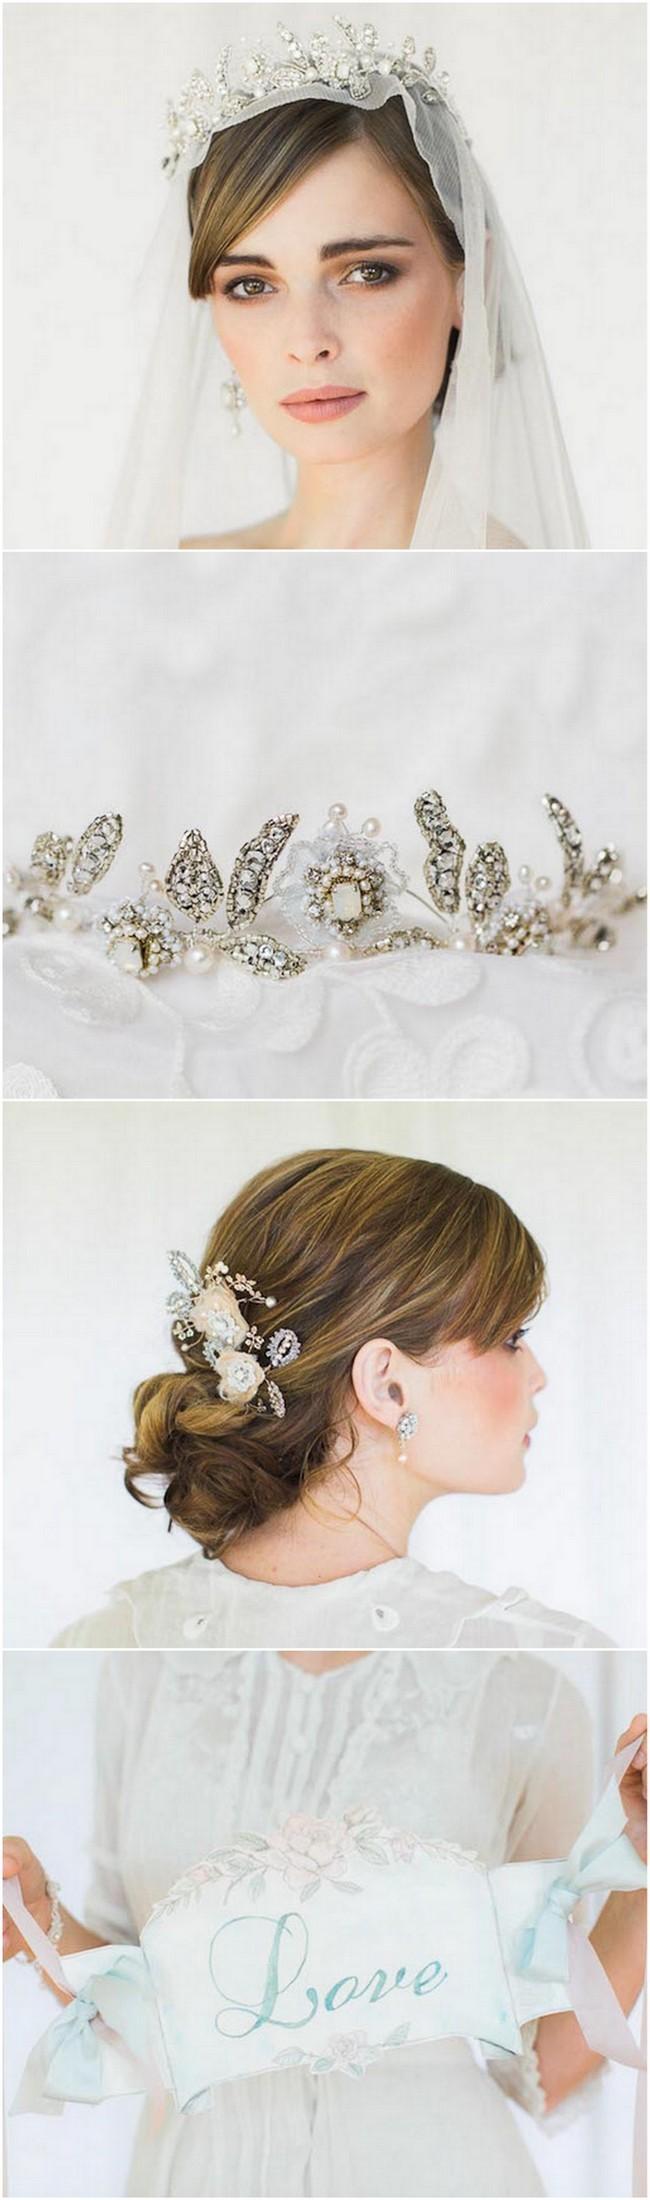 Edera Couture Lace Bridal Jewelry 54Edera Couture Lace Bridal Jewelry